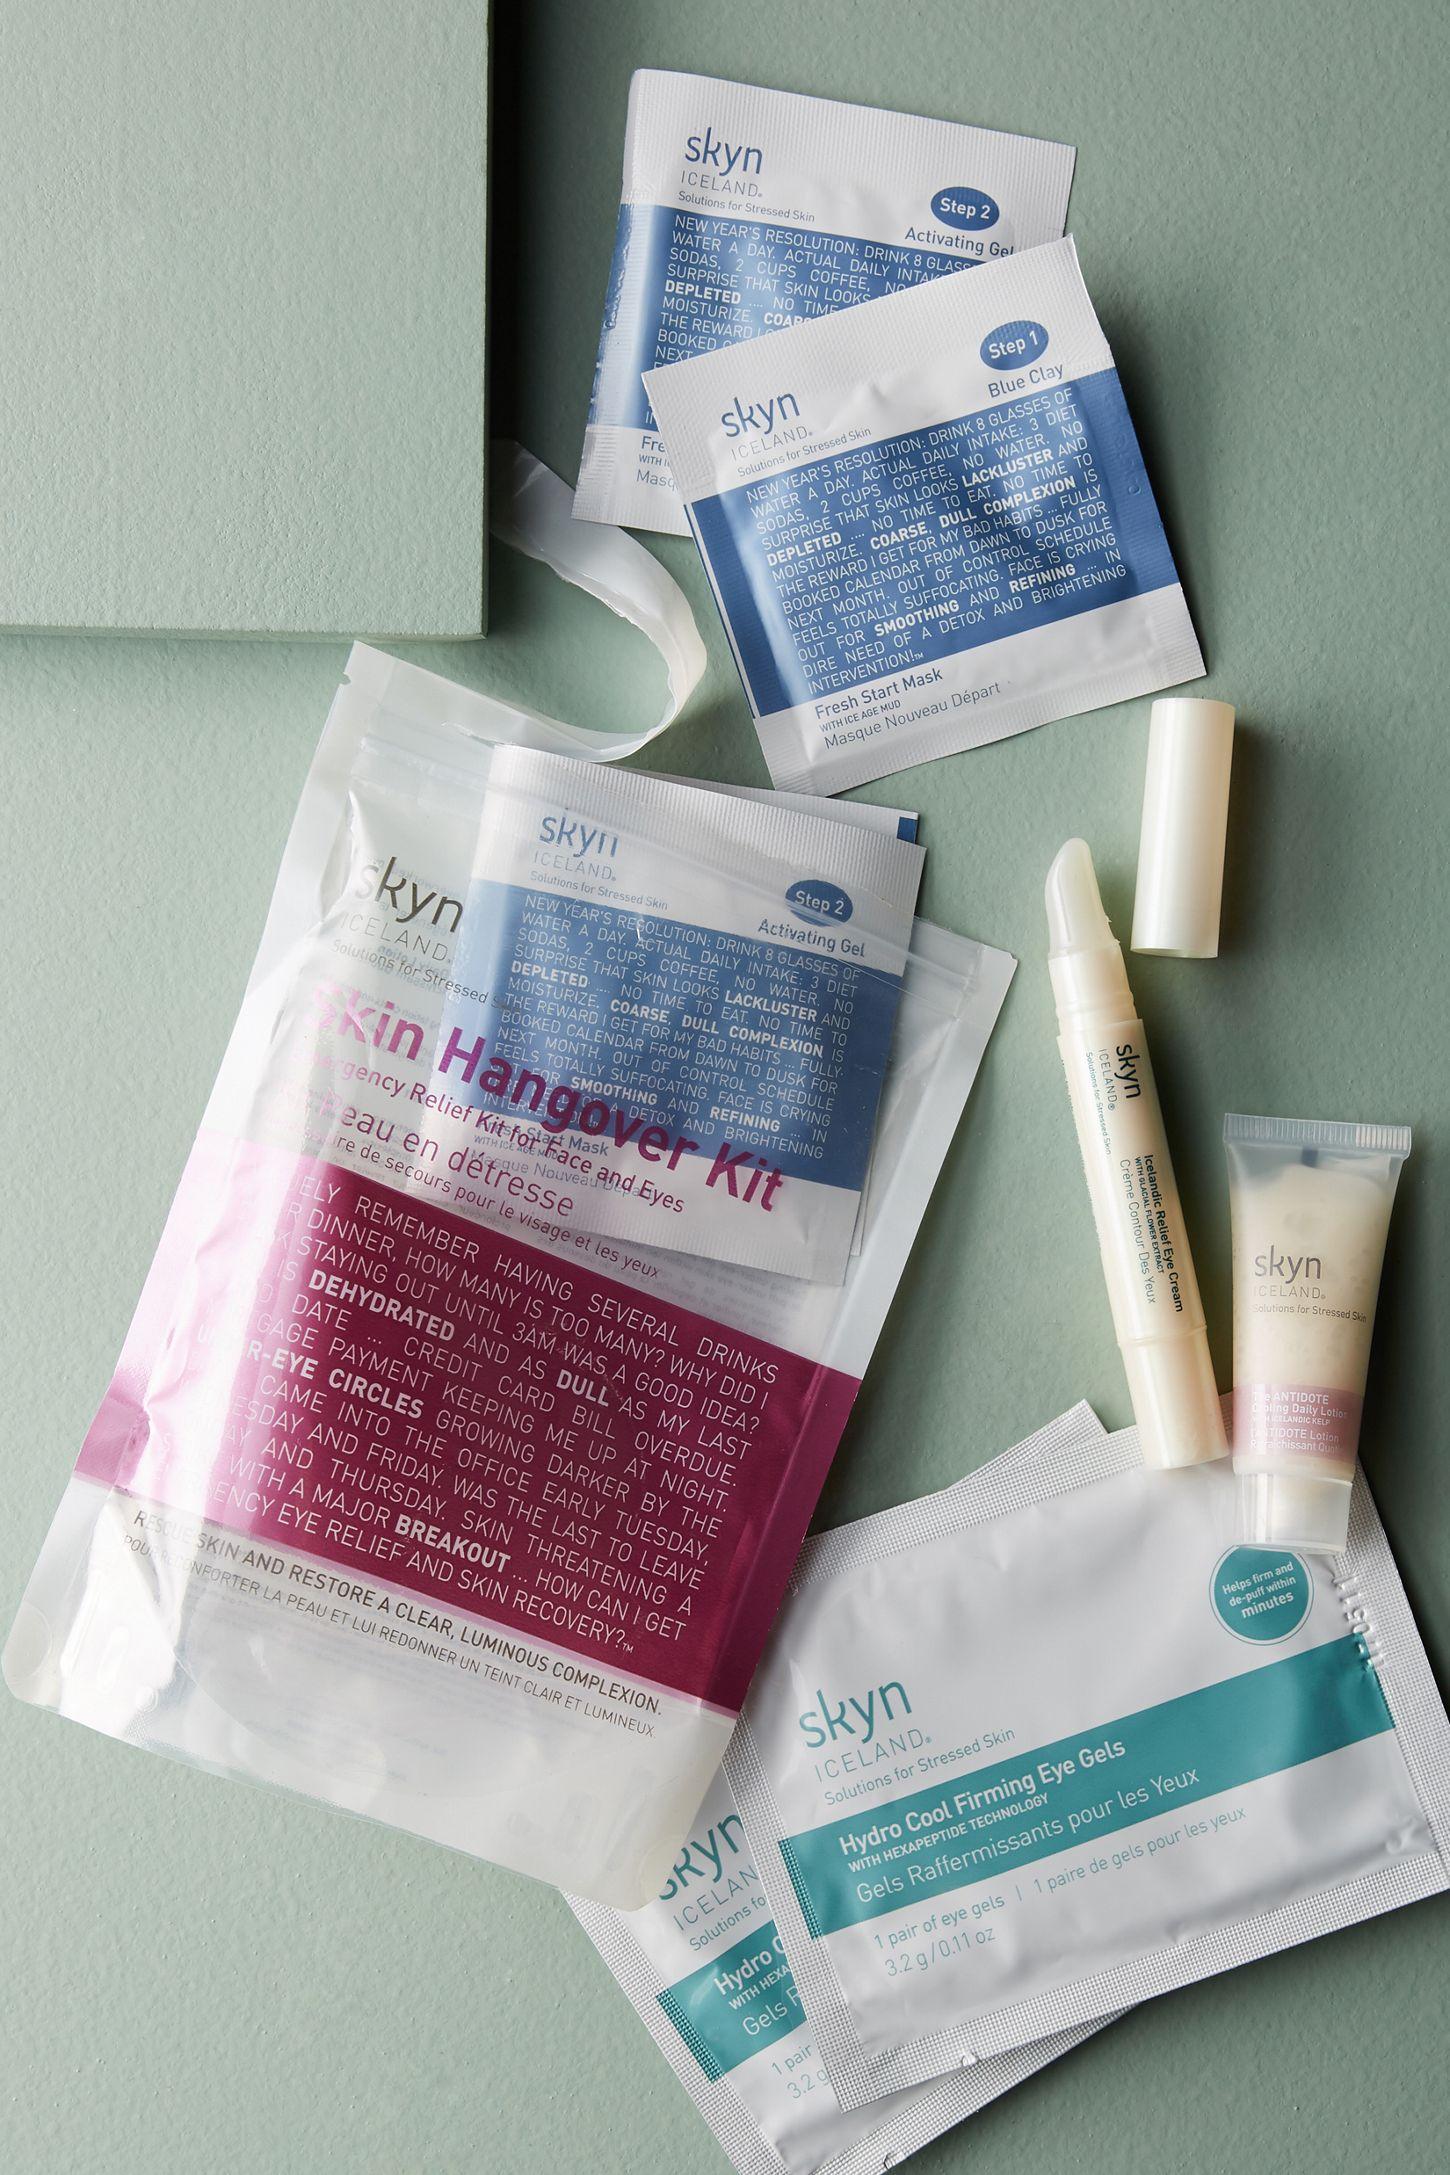 c4901fd5 skyn ICELAND Skin Hangover Emergency Relief Kit